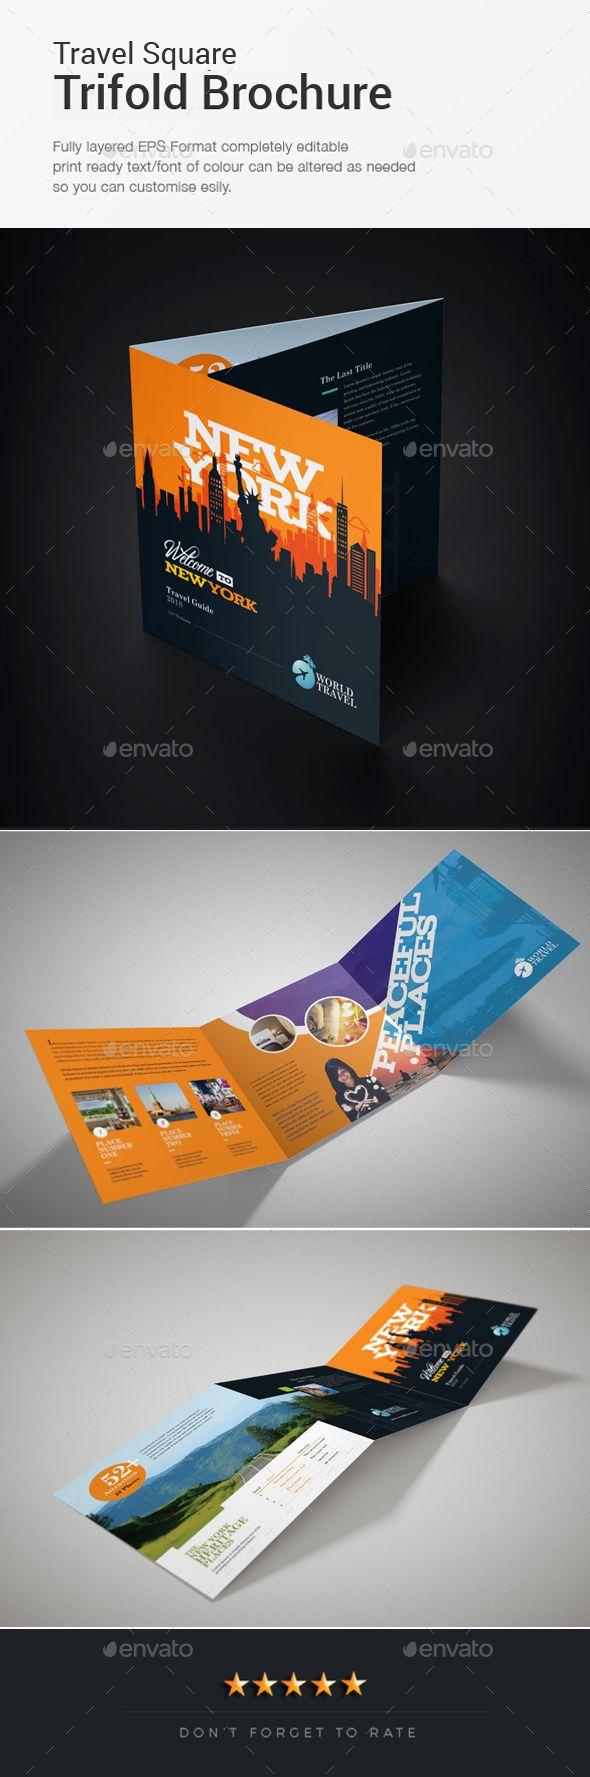 Travel Square Trifold Brochure Template Ai Illustrator Bitriquad